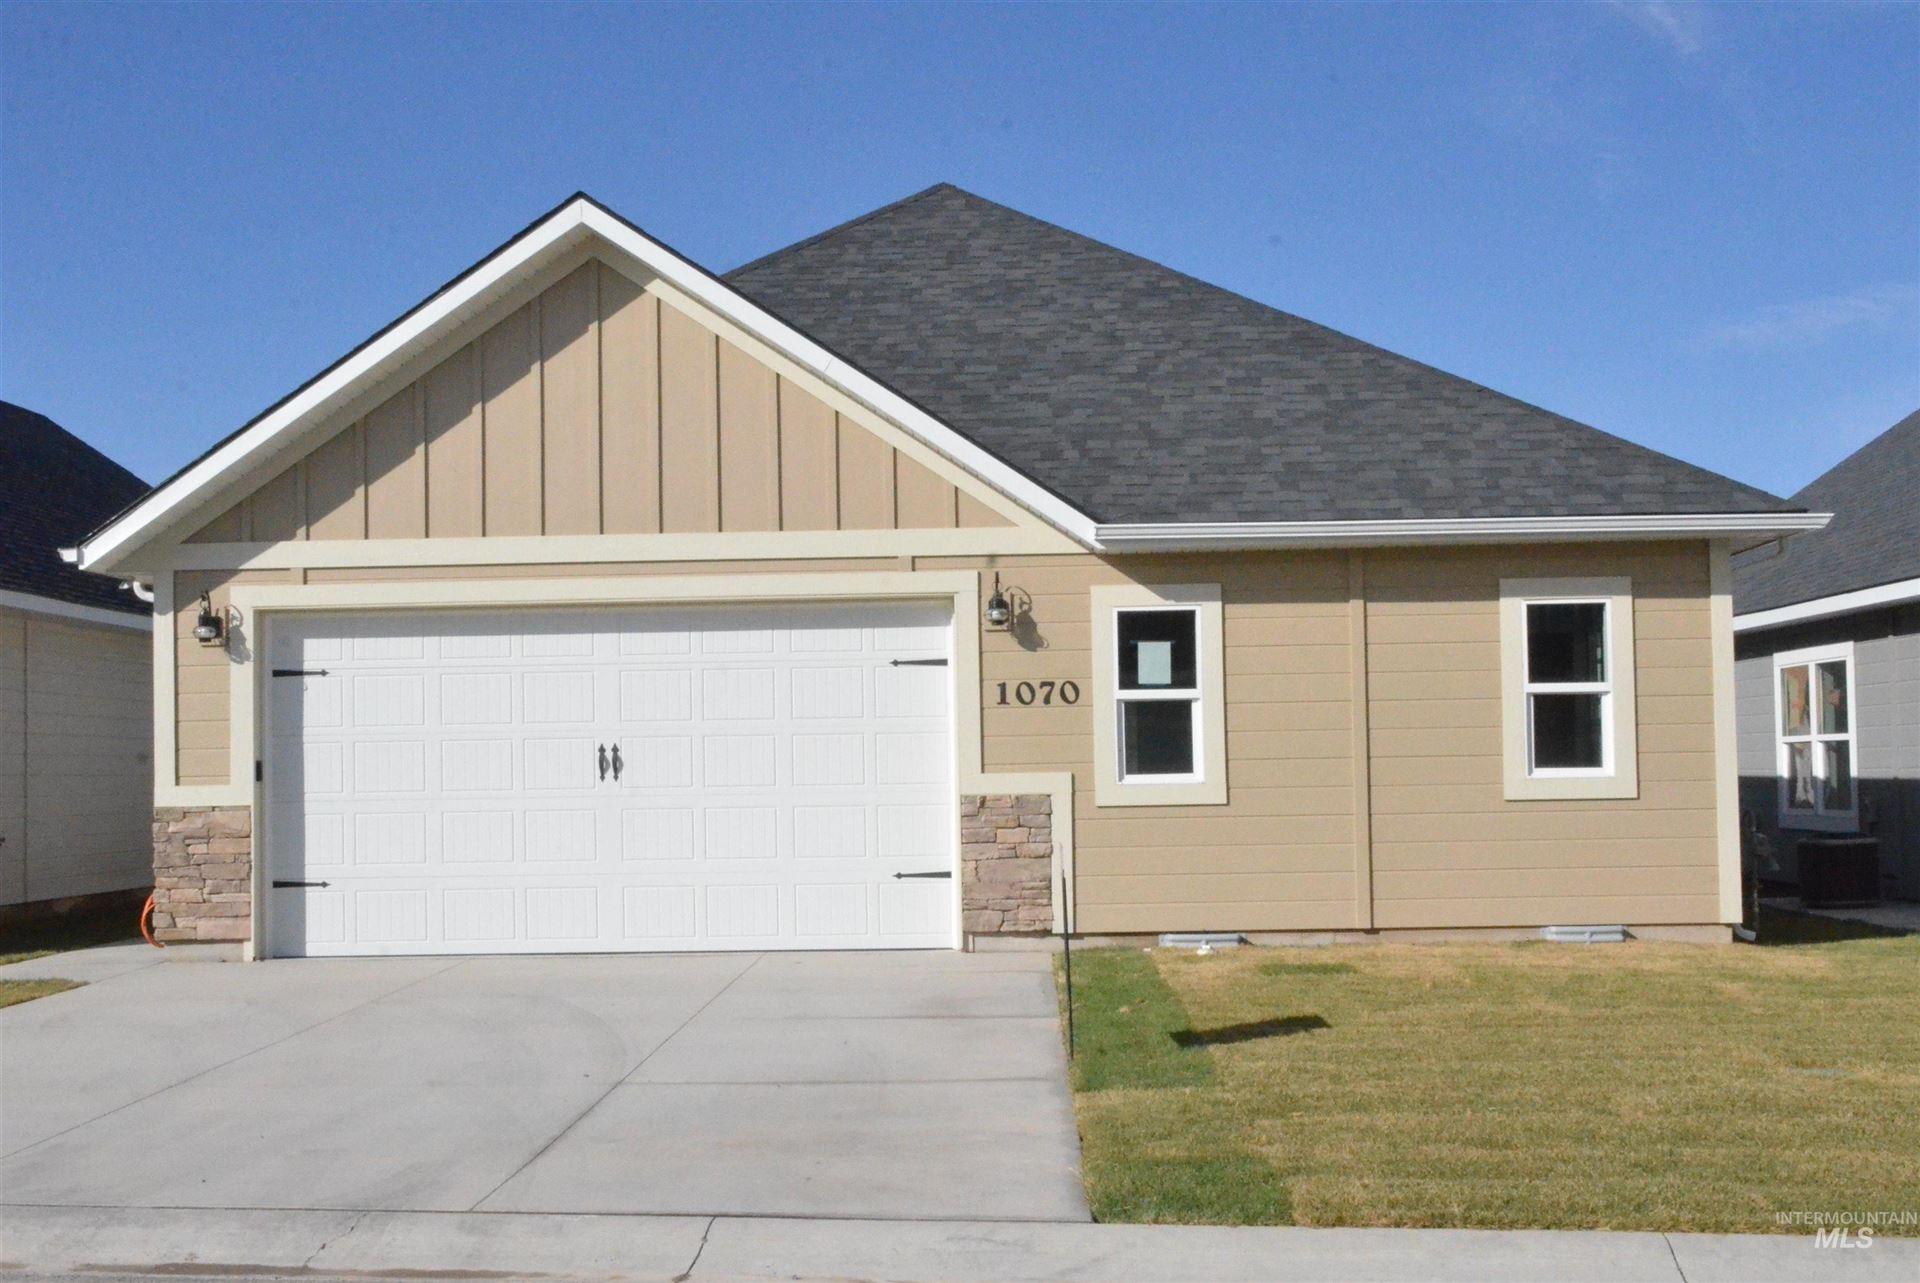 1070 Easy Ave., Twin Falls, ID 83301 - MLS#: 98812876